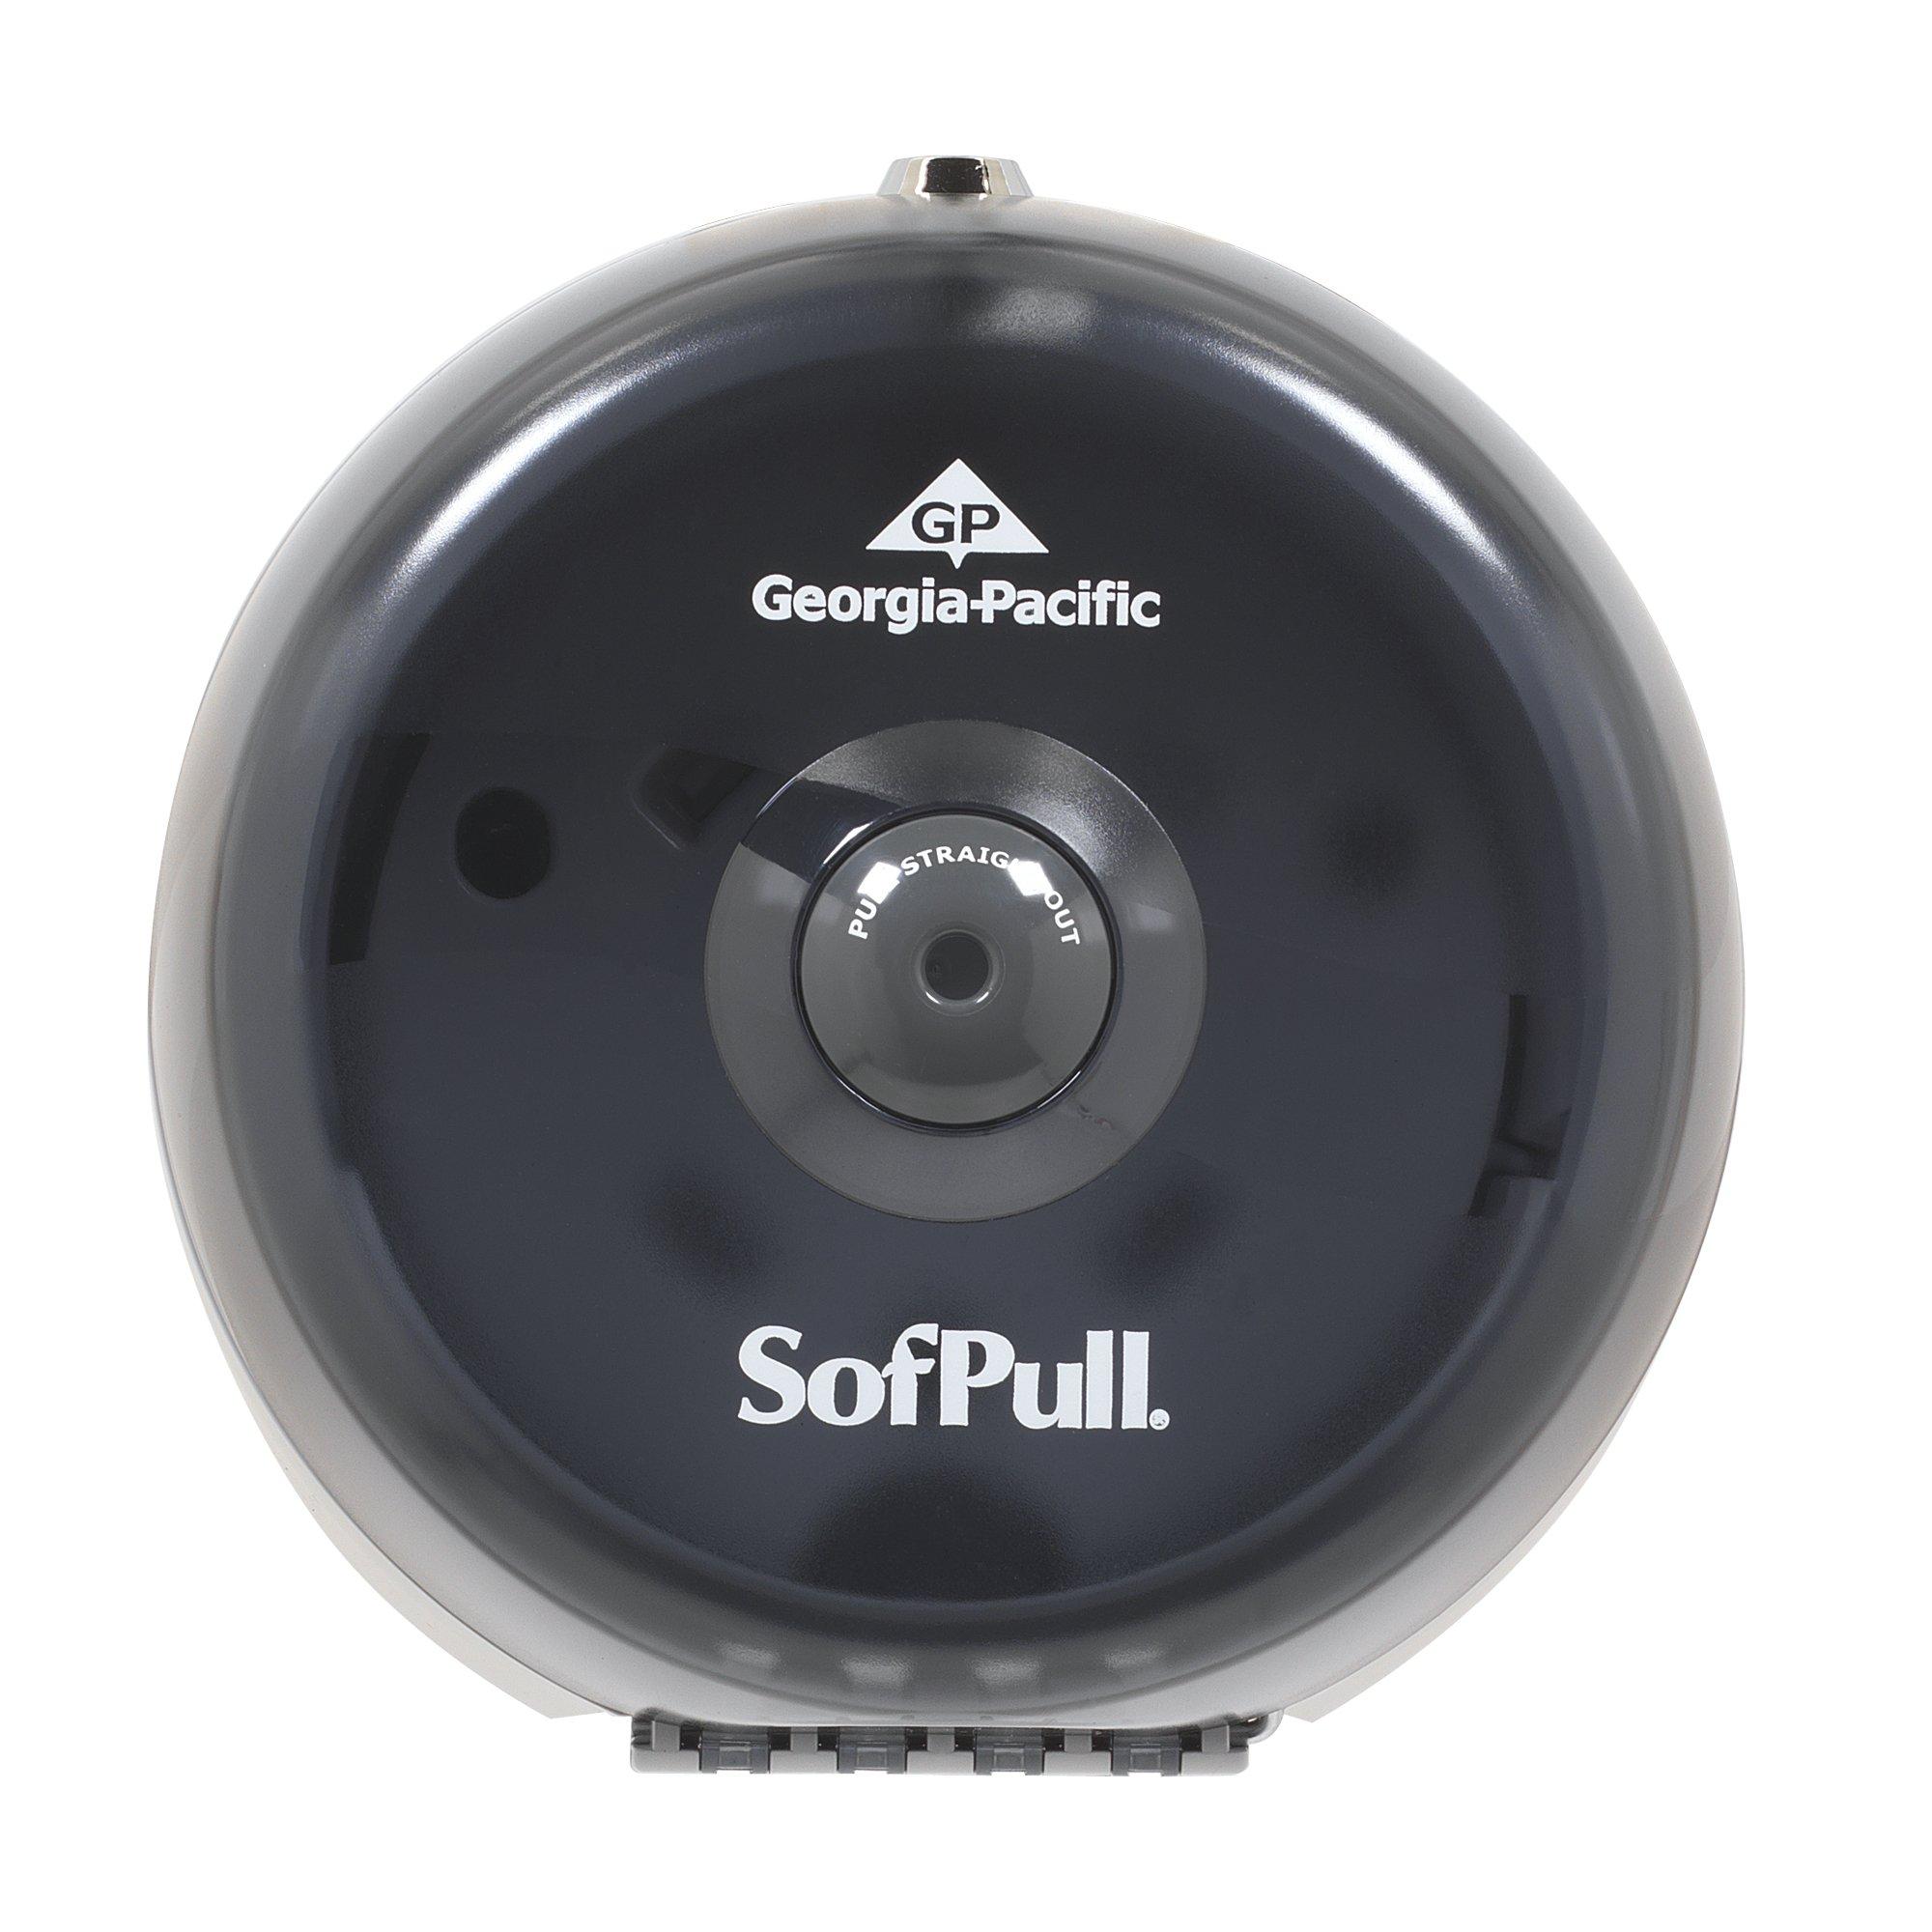 "Sofpull Centerpull Mini Toilet Paper Dispenser by GP PRO (Georgia-Pacific), Translucent Smoke, 56513,8.750"" W x 7.000"" D x 9.000"" H"